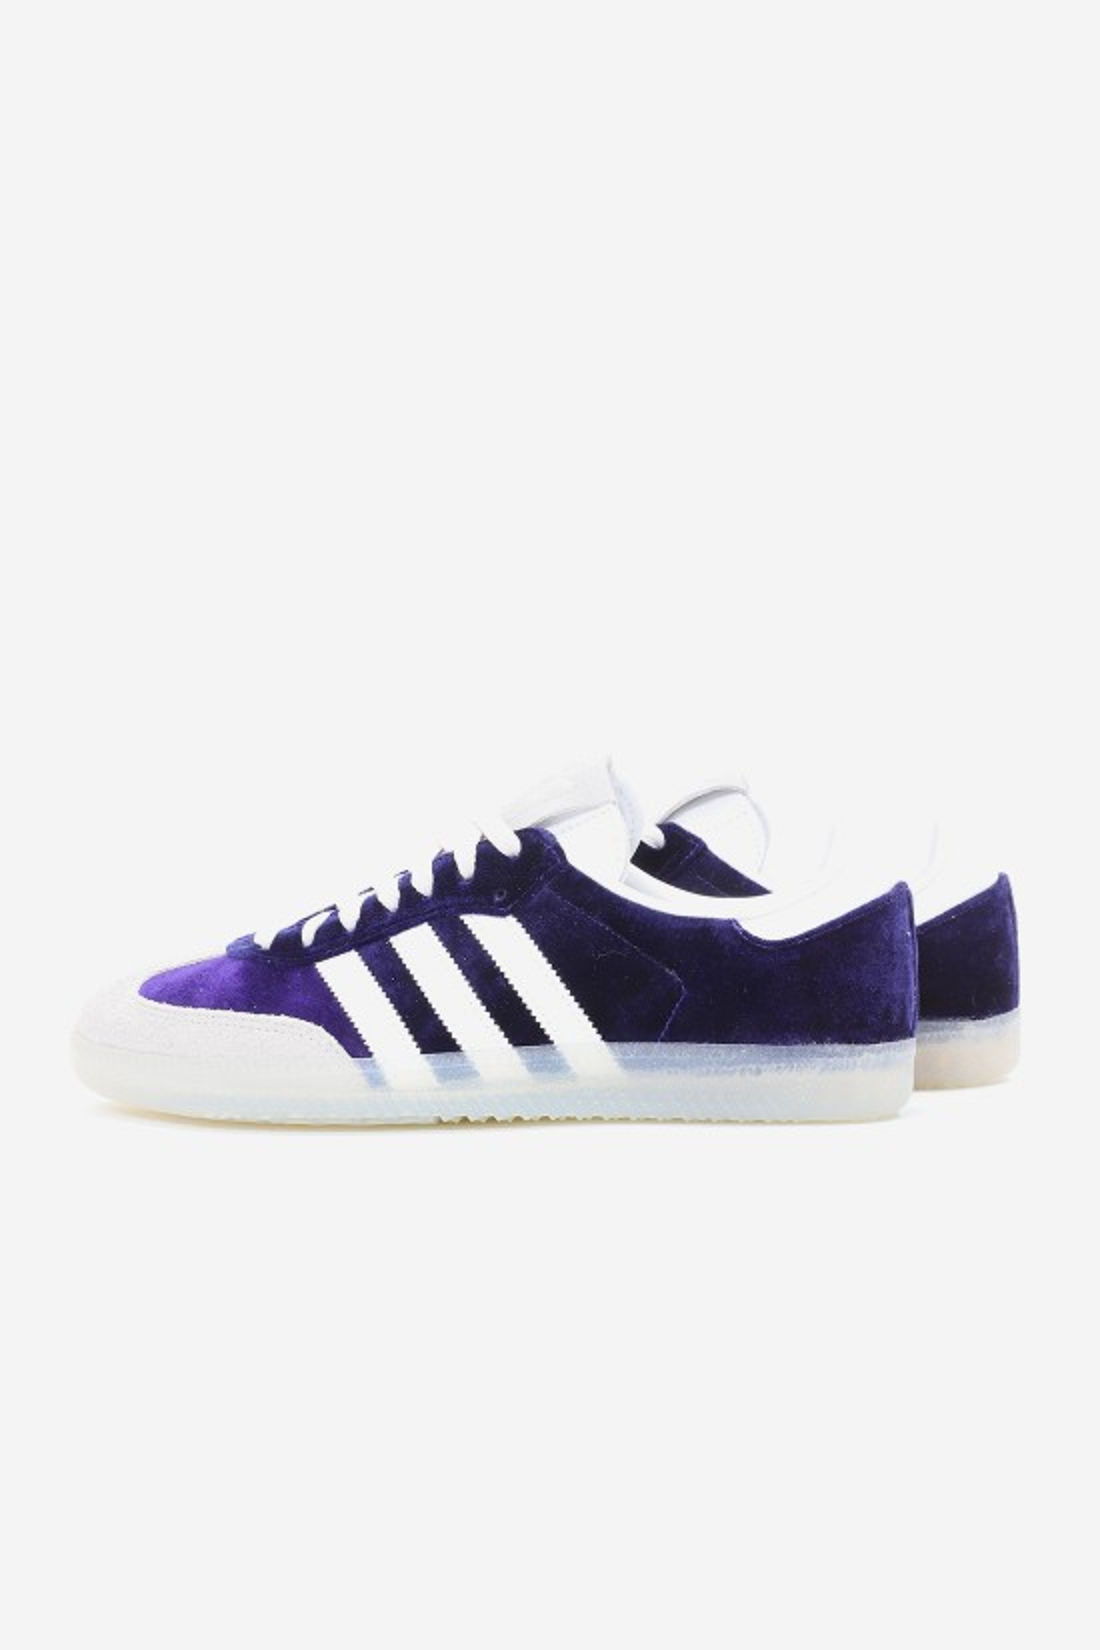 ADIDAS / Samba og Purple